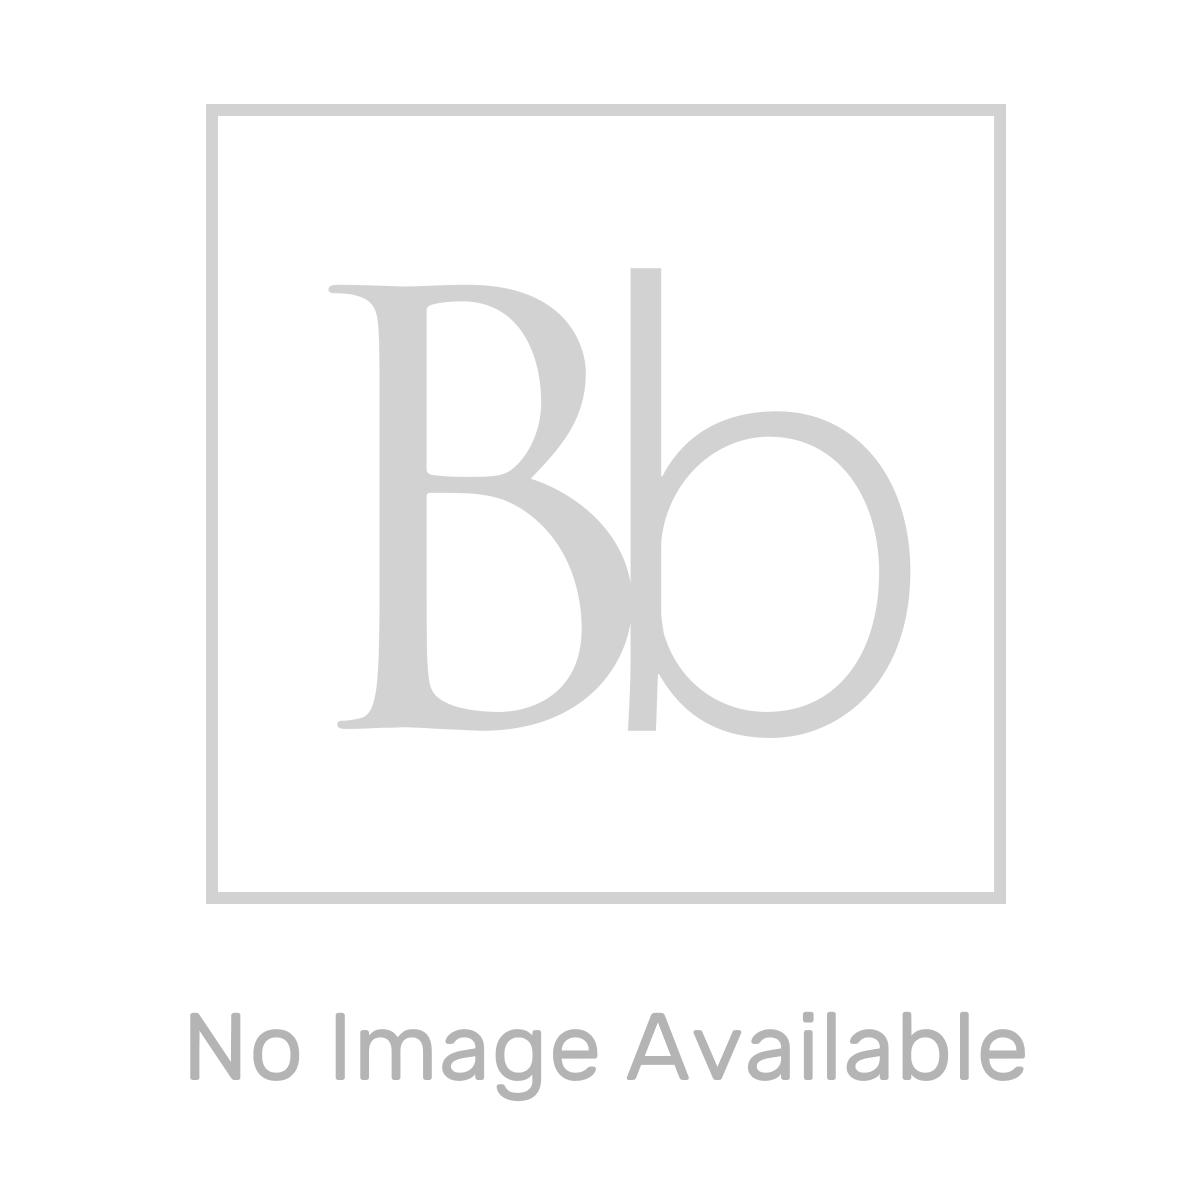 Kartell K-vit Clear Vista Circular LED Mirror 600mm